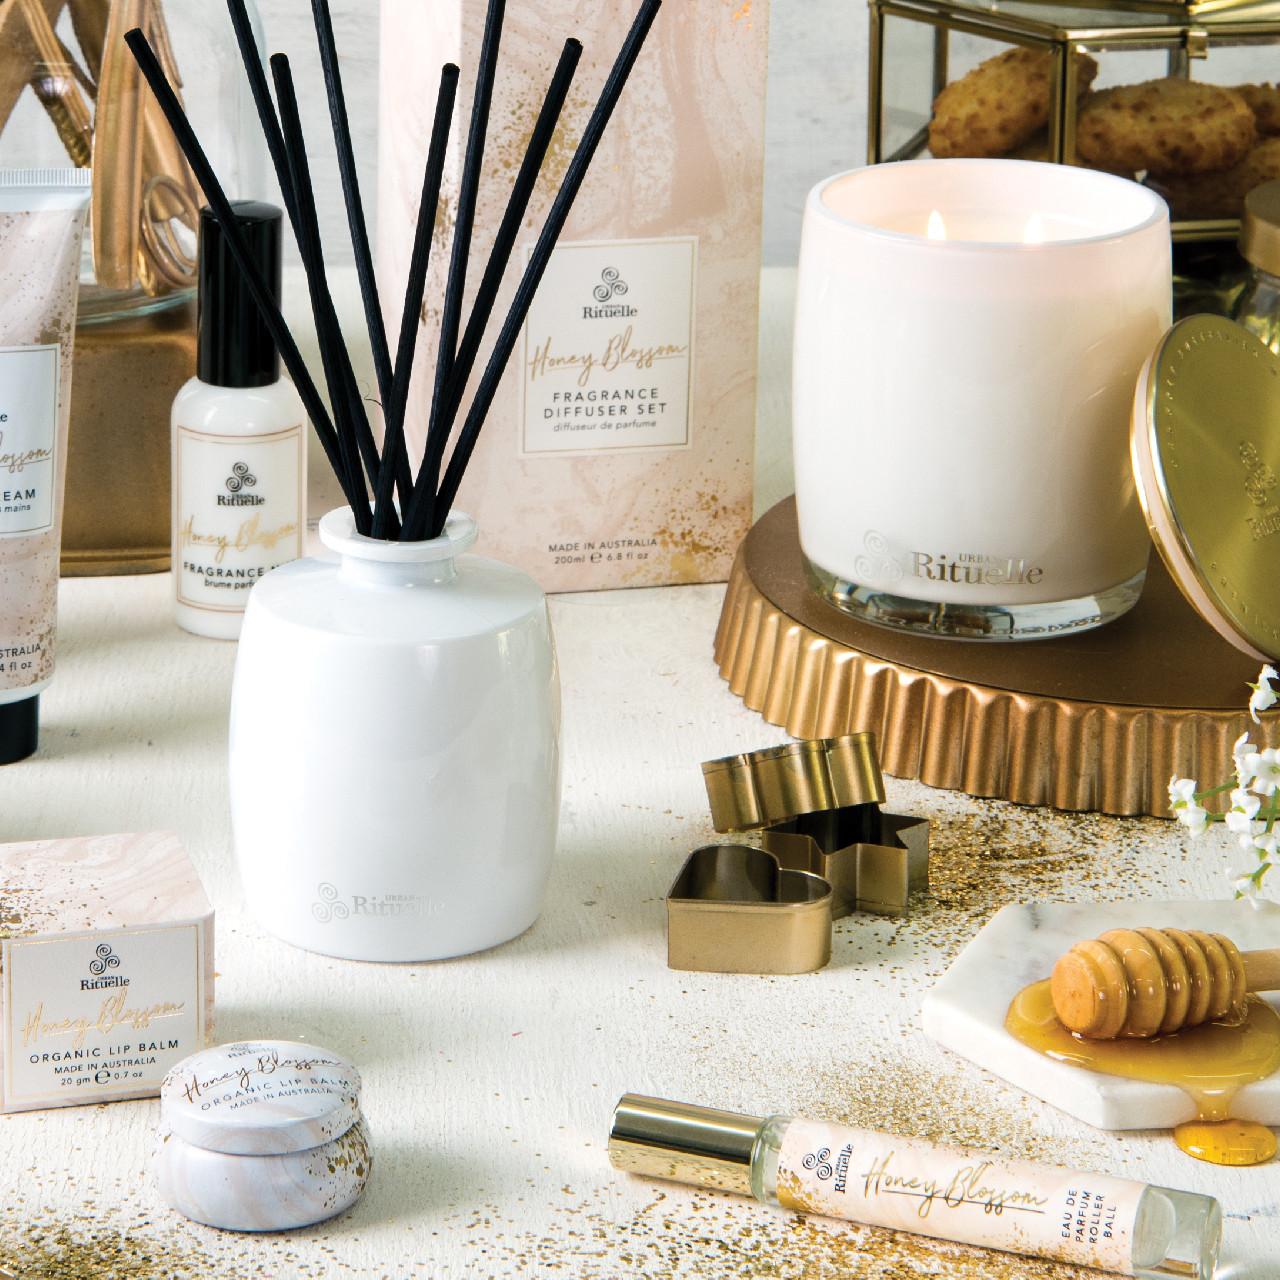 Sweet Treats - Honey Blossom - Fragrance Diffuser Set -  Urban Rituelle